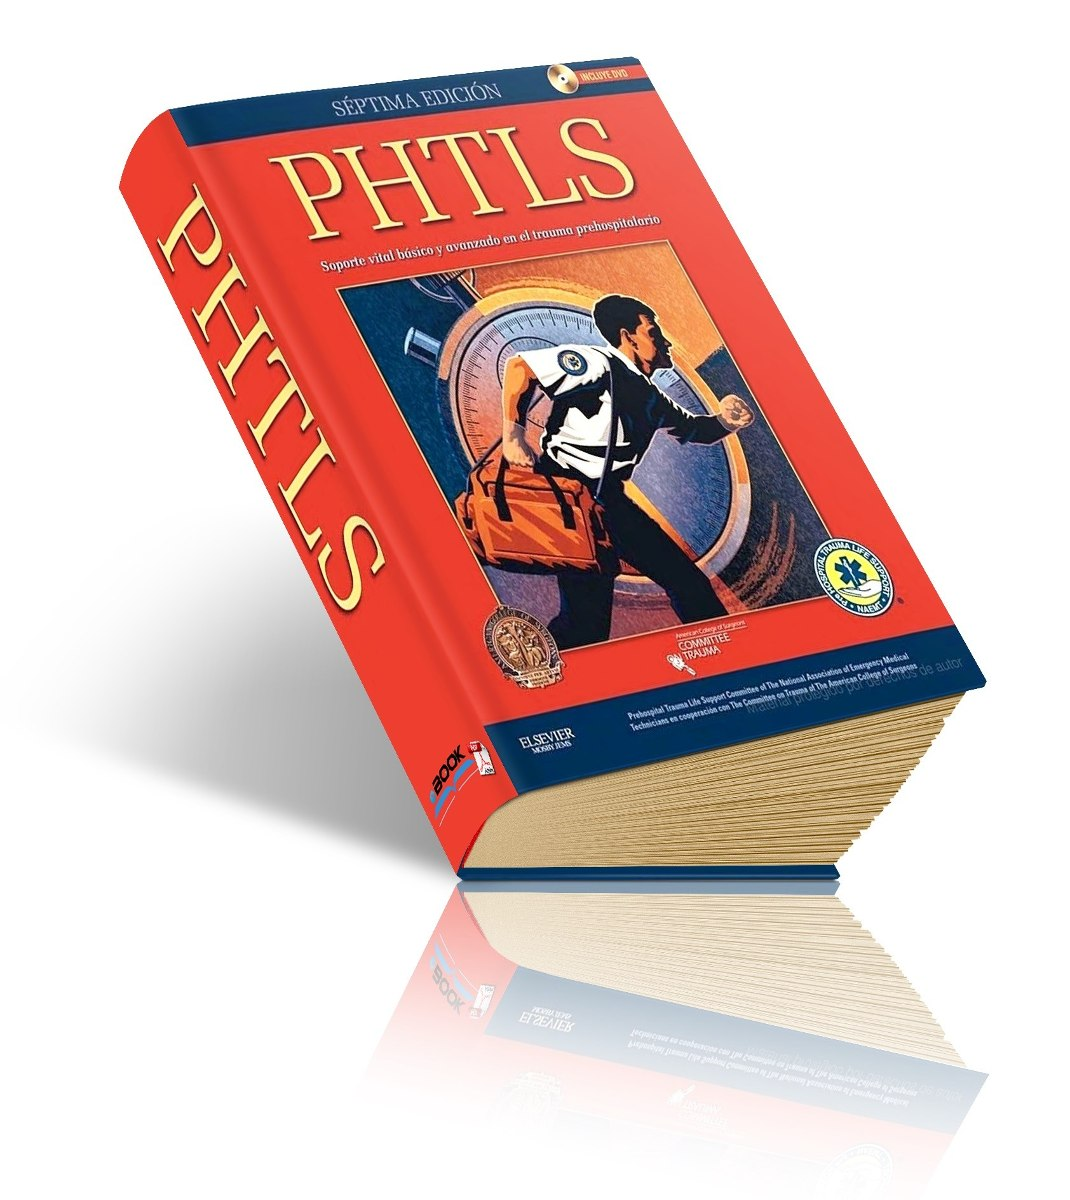 Phlts Manual